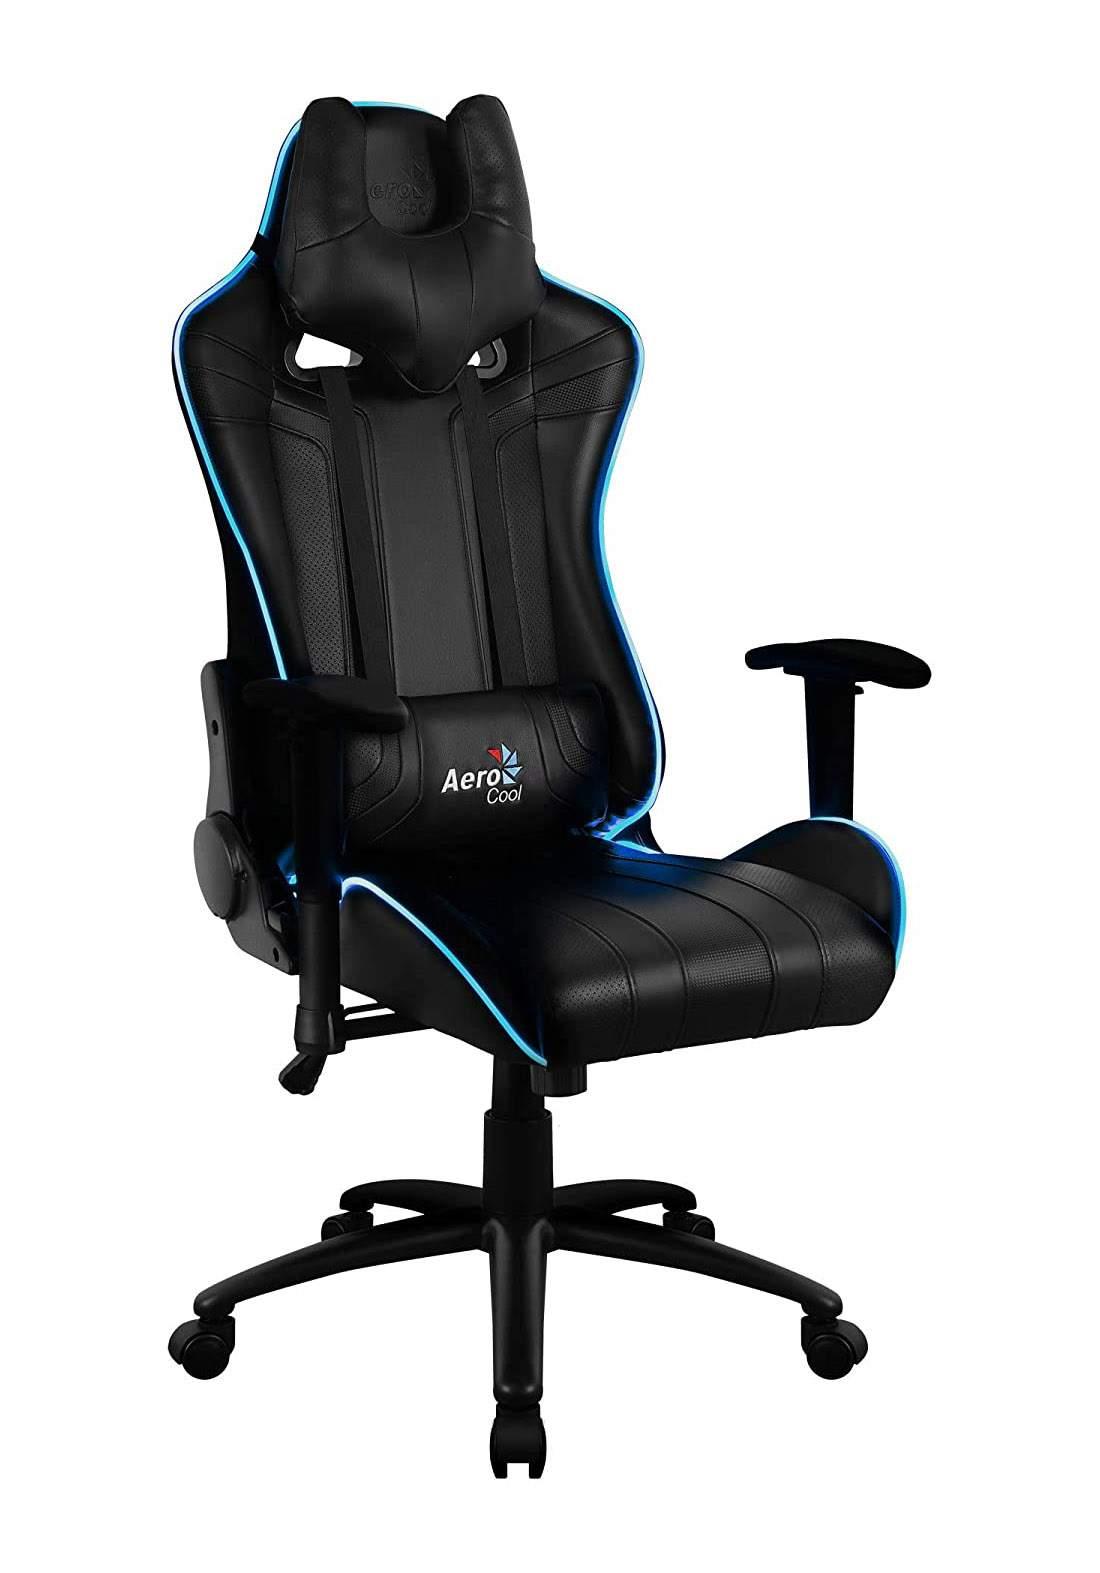 Aerocool AC120 AIR RGB Gaming Chair - Black  كرسي العاب